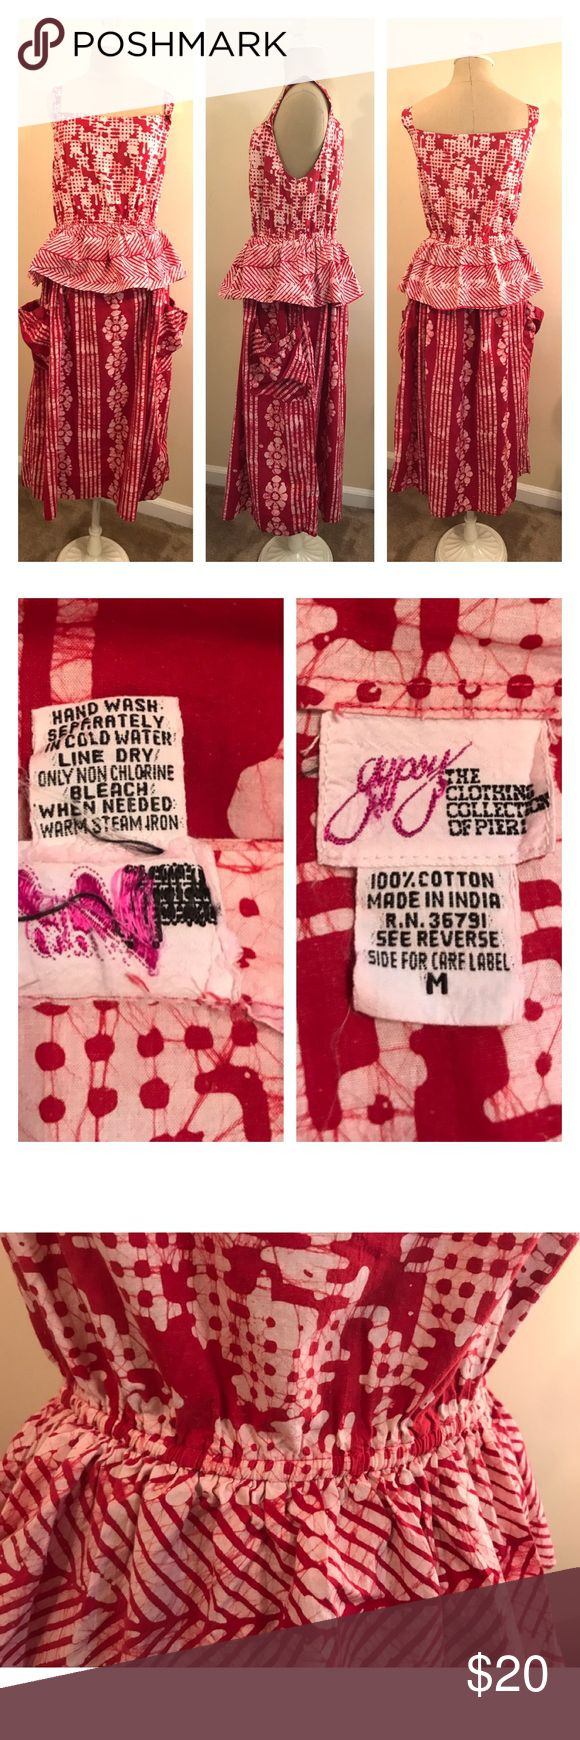 "Gypsy brand by Pier 1 vintage batik dress M Interesting festival dress with batik pattern by Gypsy / Pier 1 size medium. Underarm to underarm 19""shoulder to hem 48"". Dresses"